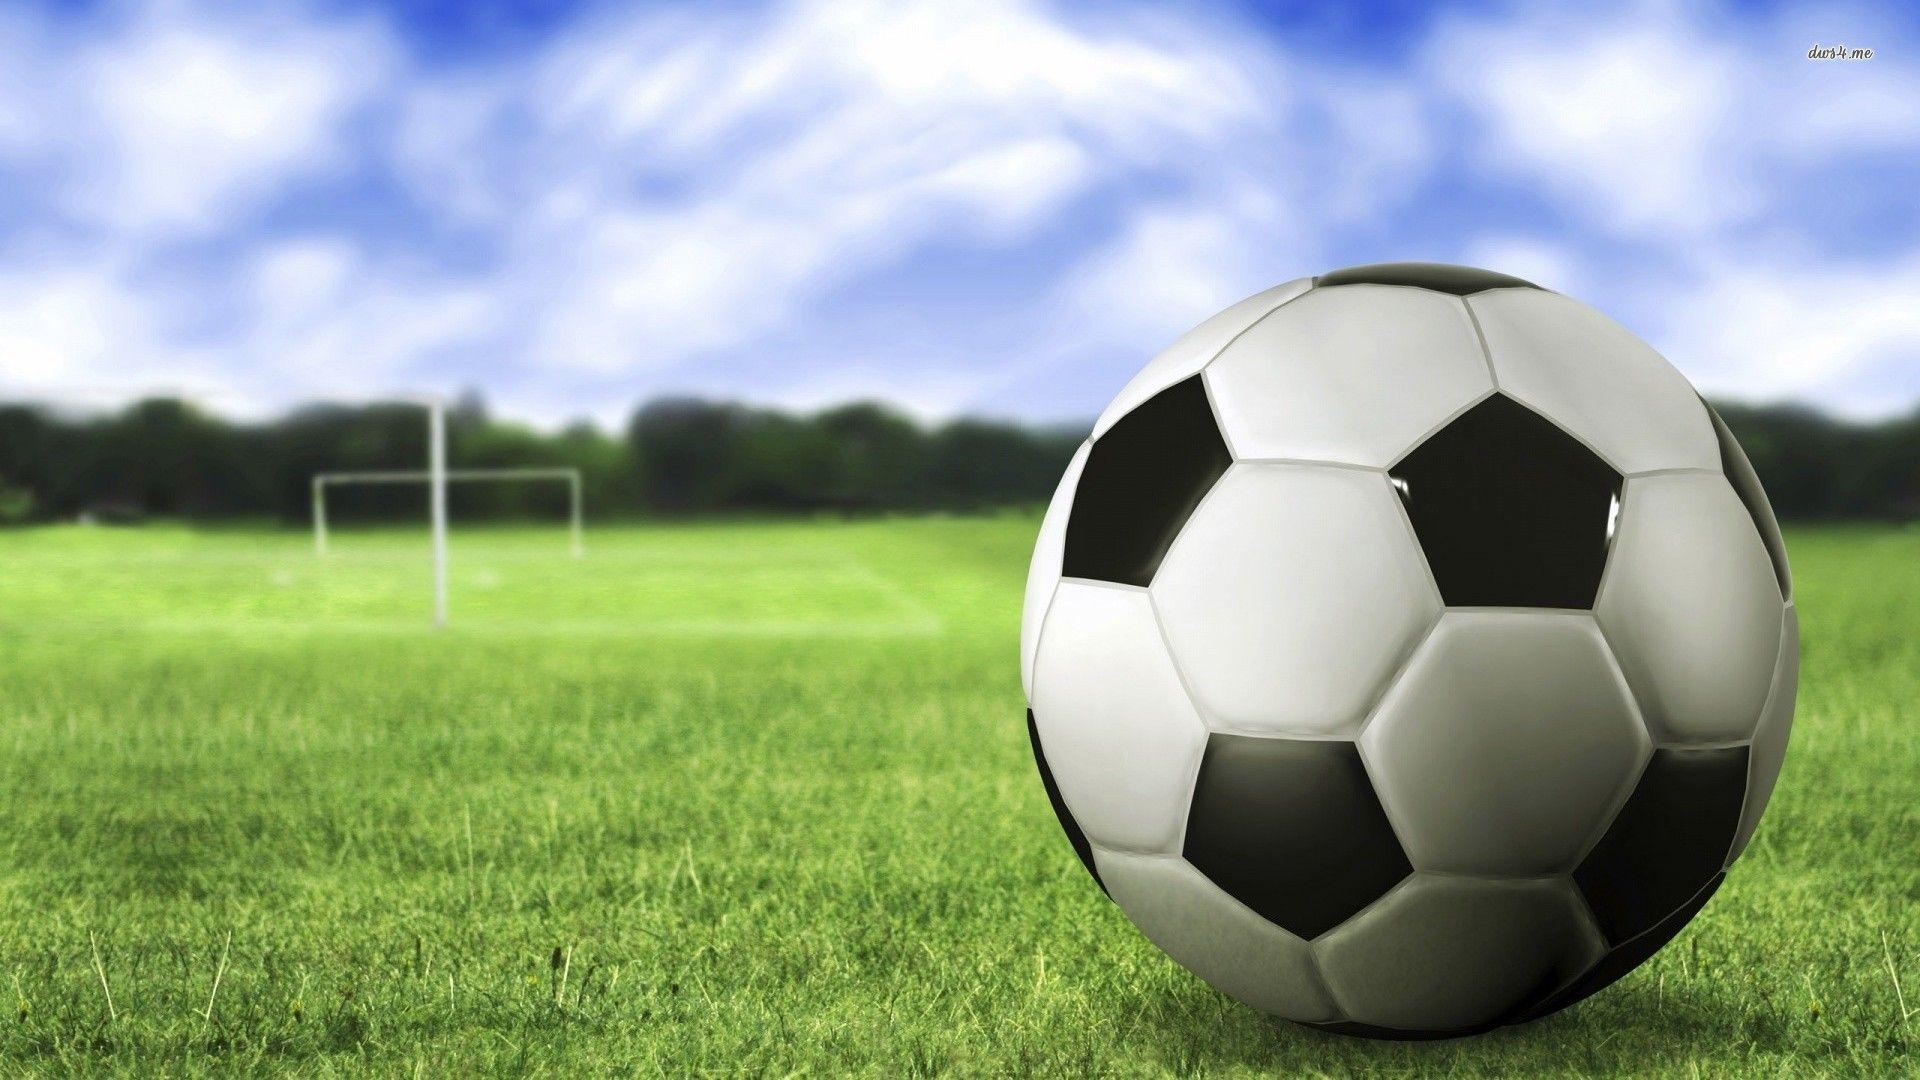 Soccer ball on field hd wallpapers Soccer ball, Soccer